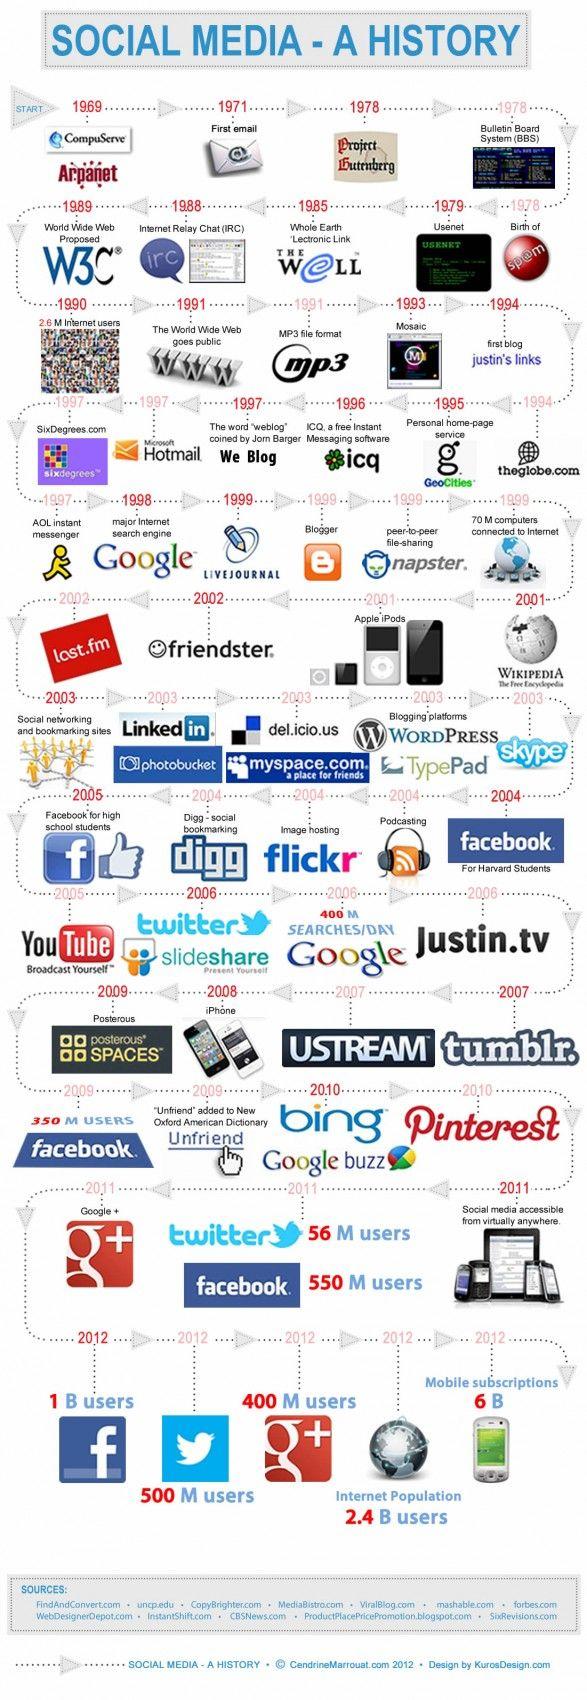 Social Media - A History